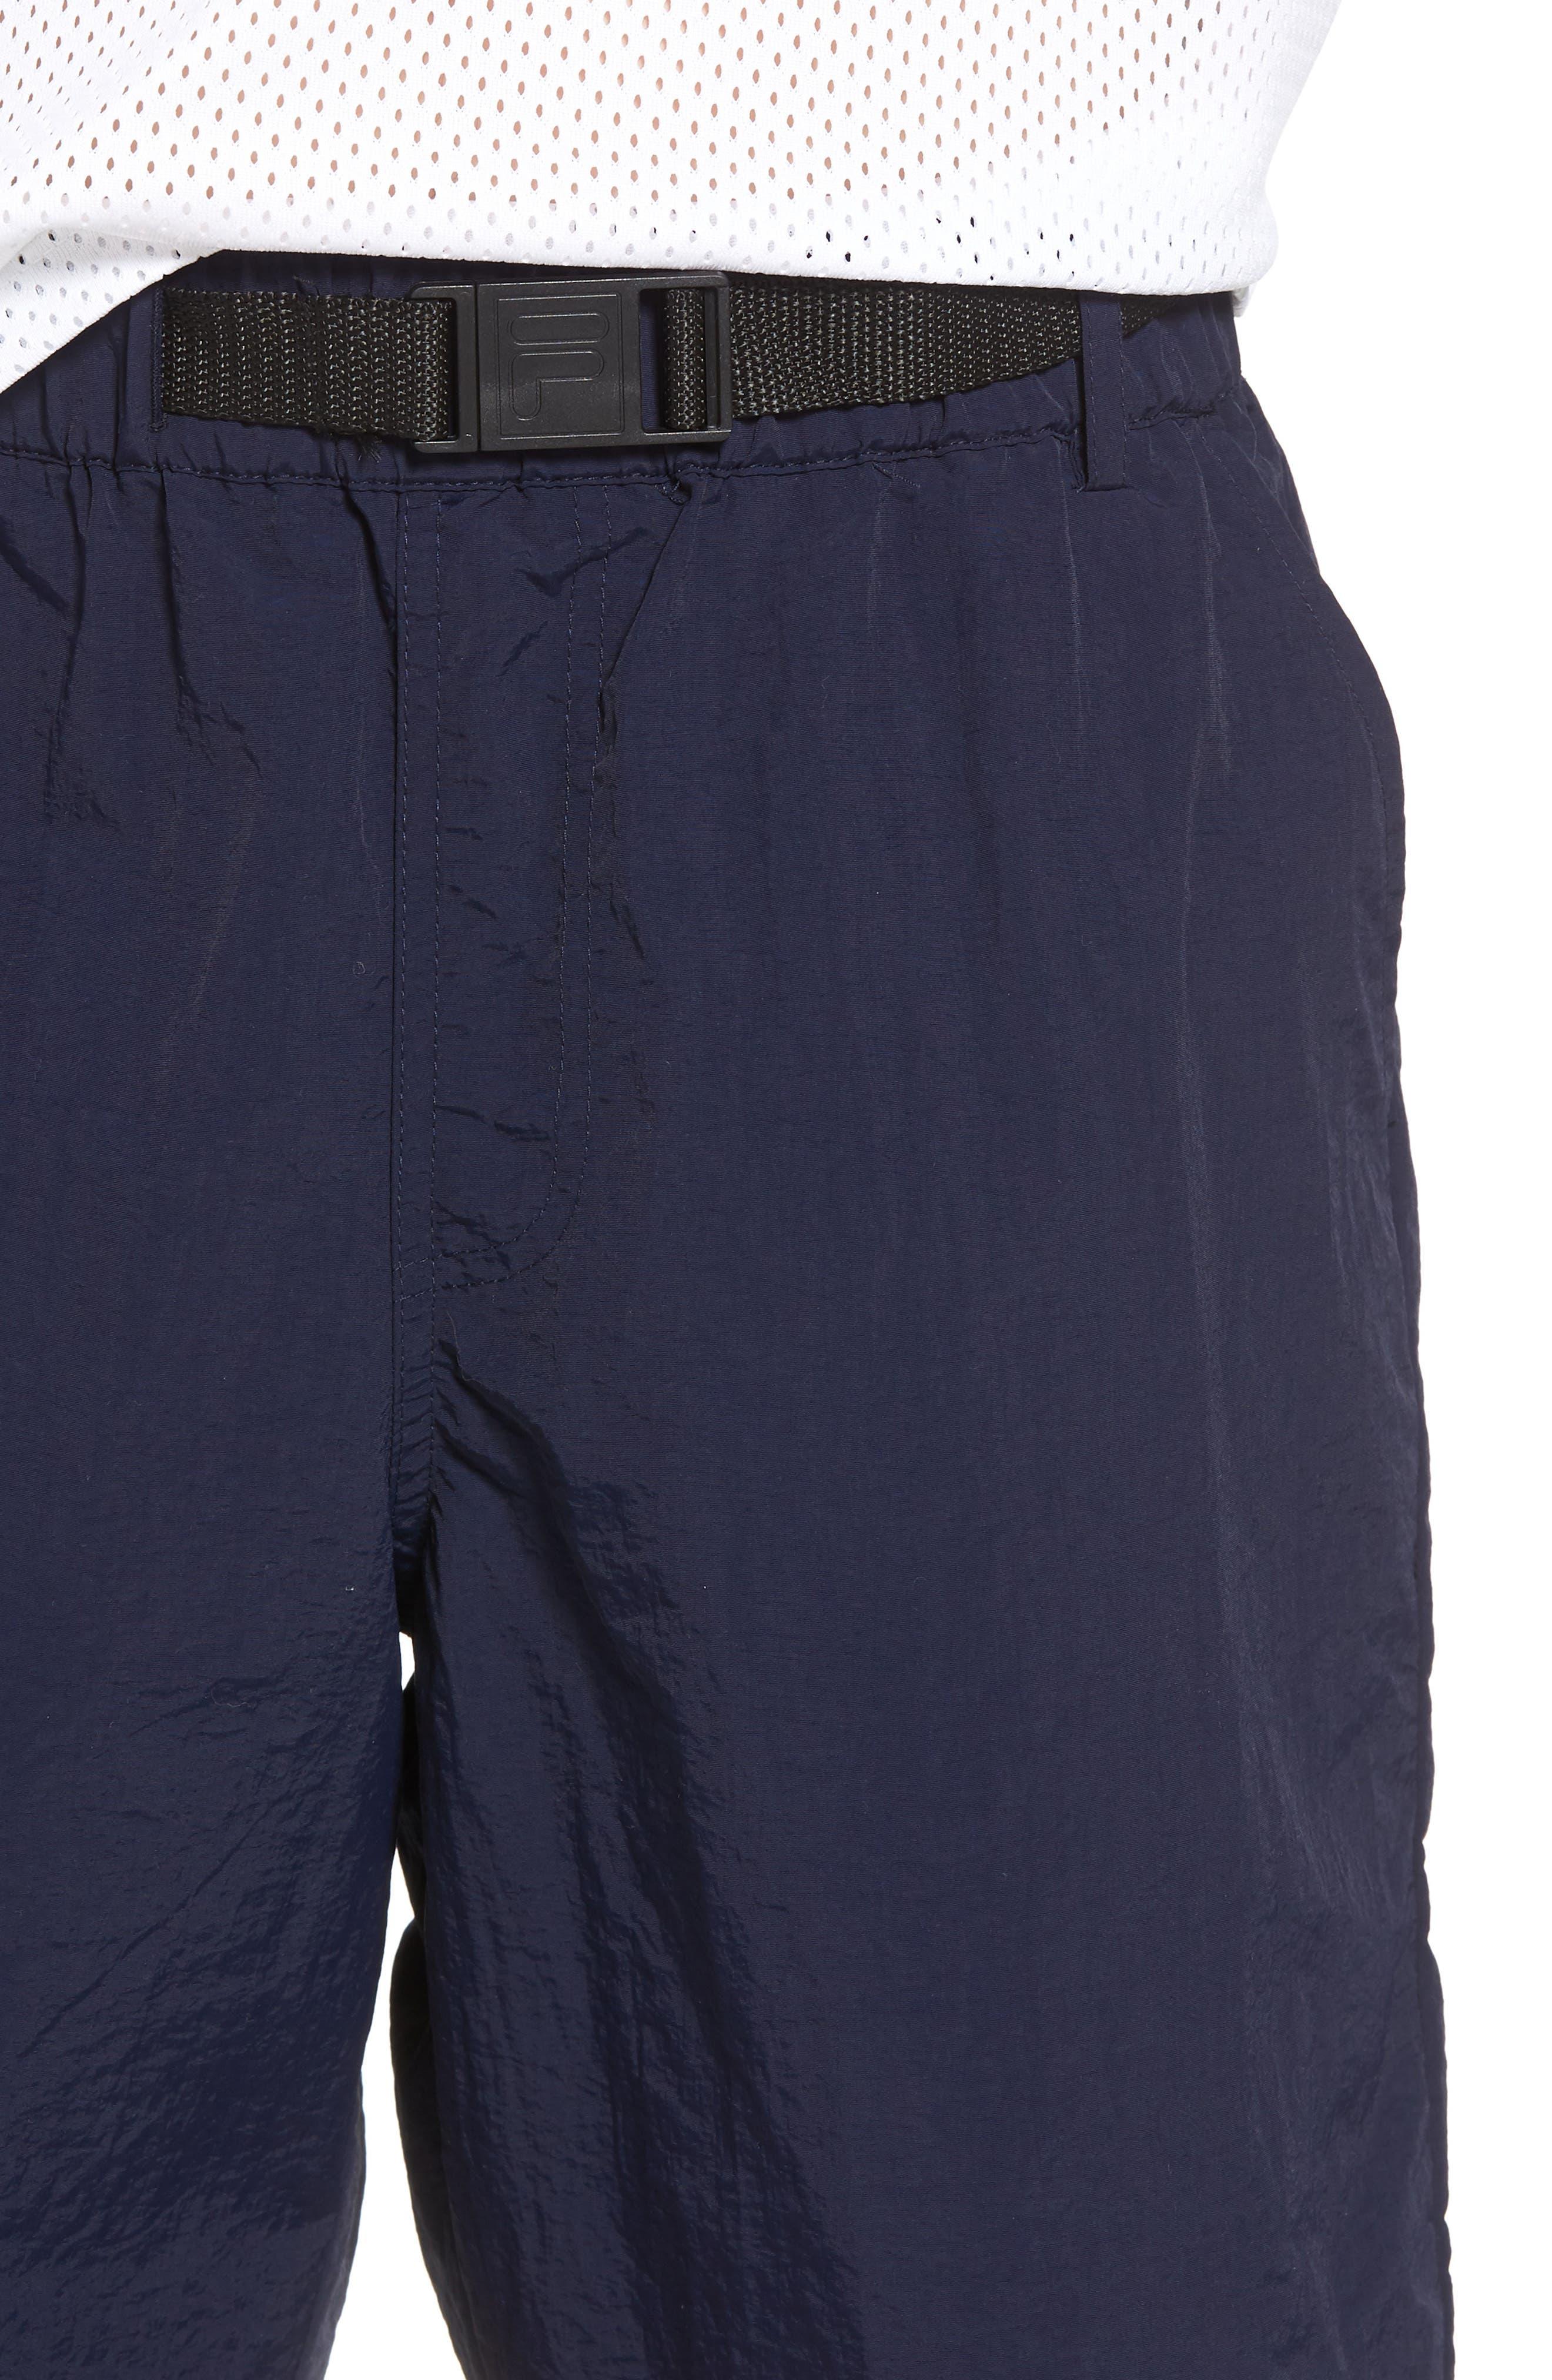 Mondy Shorts,                             Alternate thumbnail 19, color,